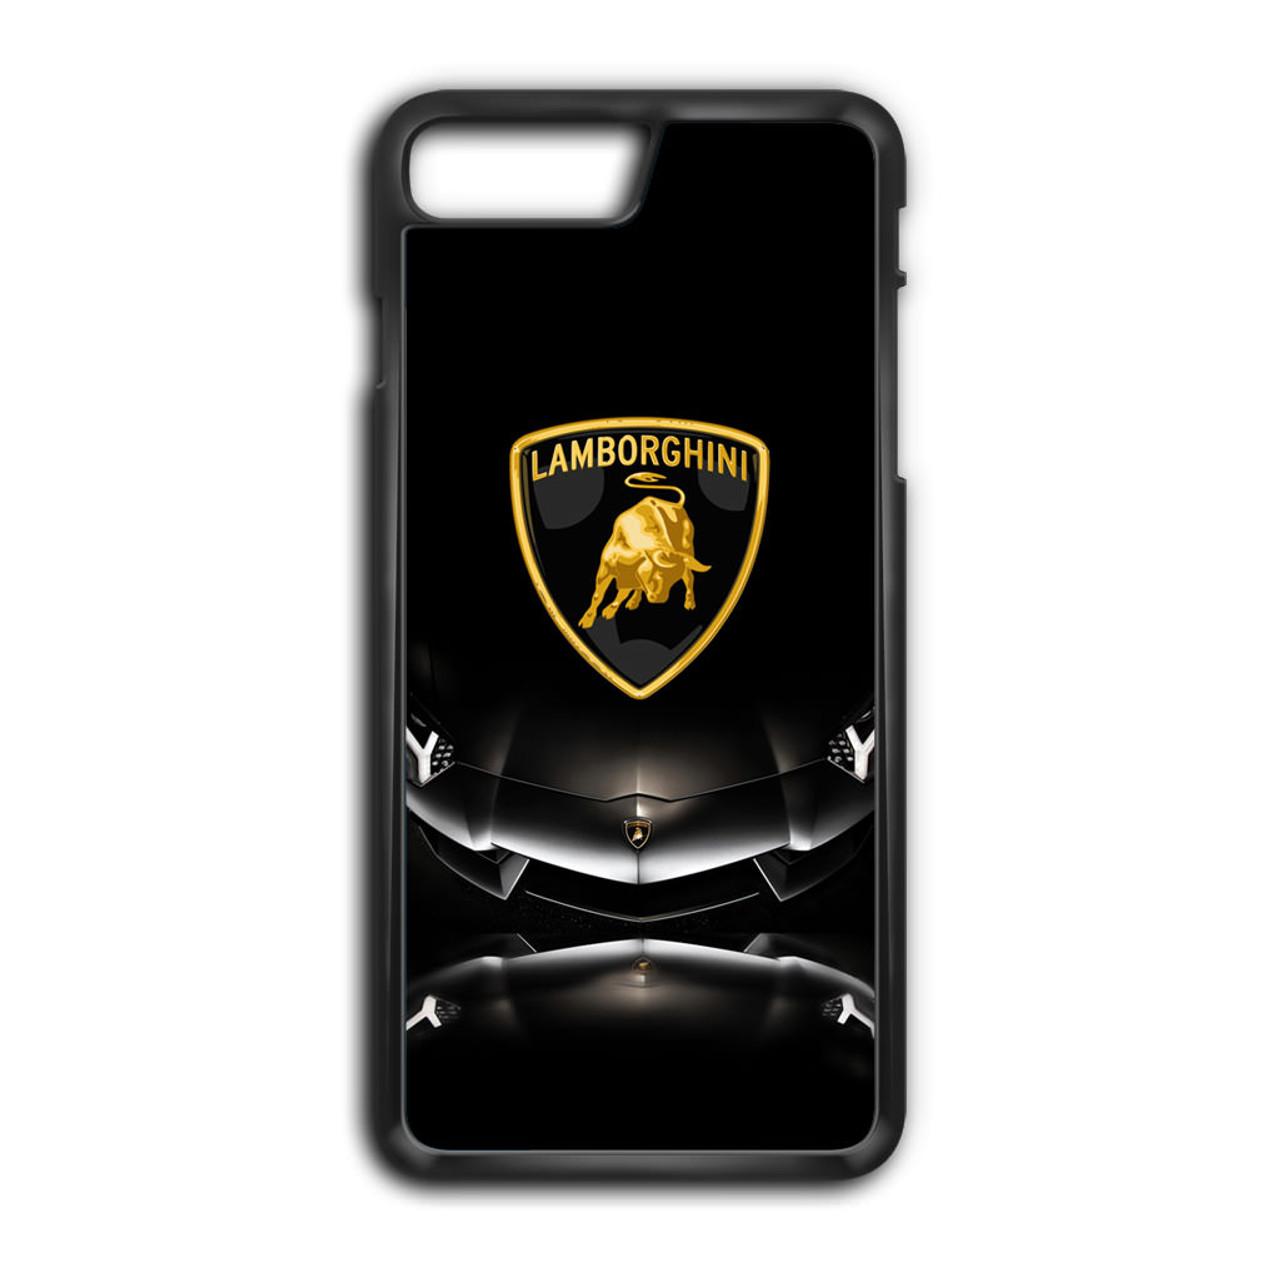 finest selection ddf8b 4aaa3 Lamborghini iPhone 8 Plus Case